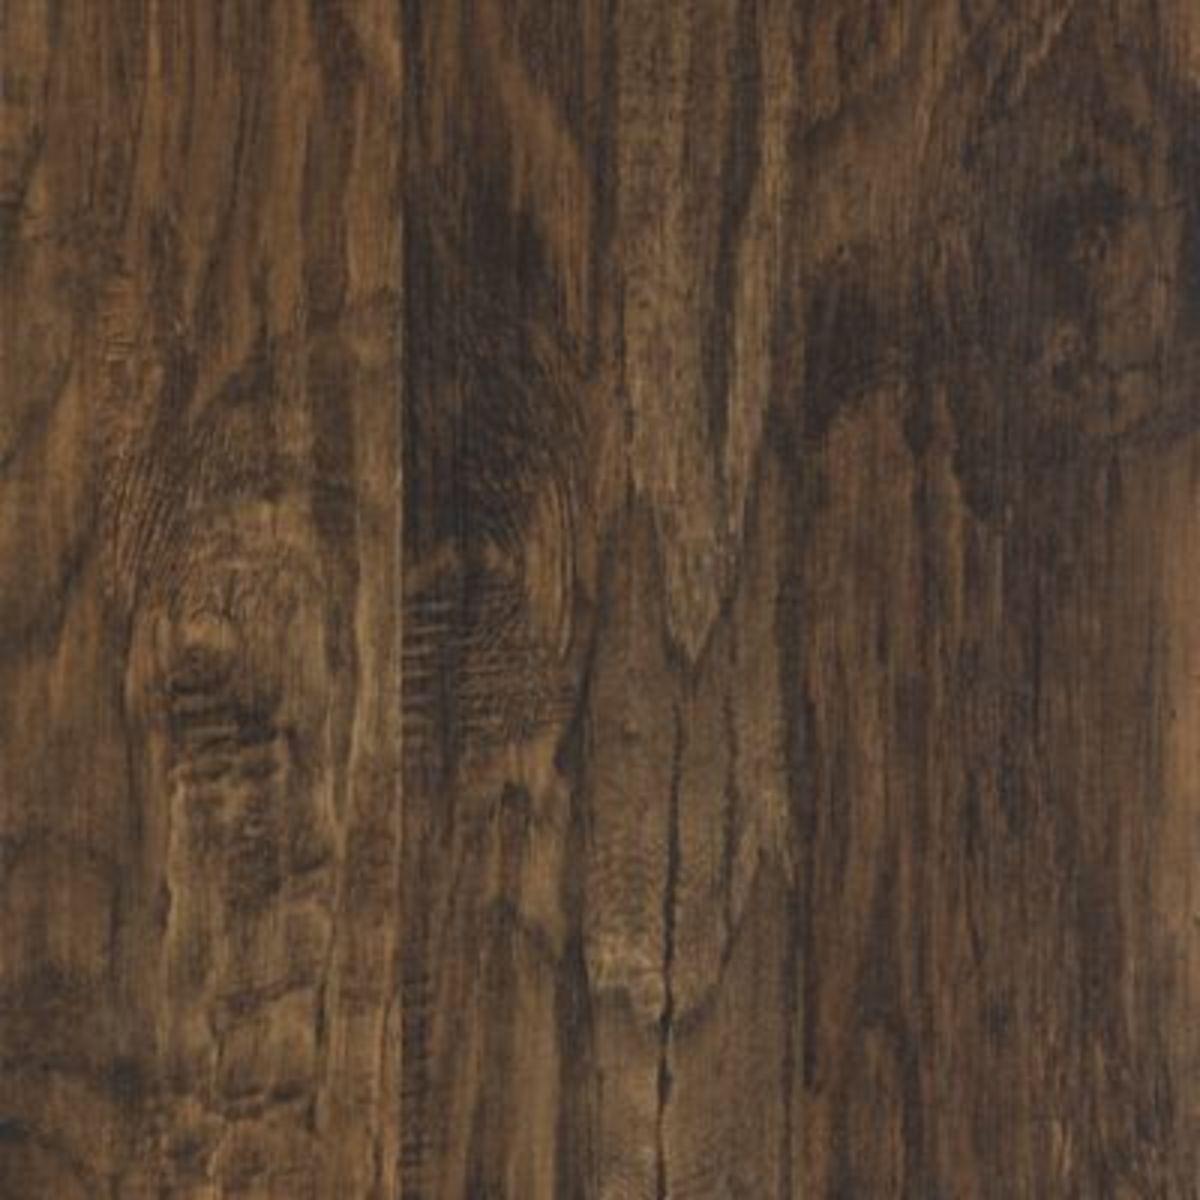 Mohawk Woodlands Vinyl Tile, Whiskey Barrel Laminate Flooring